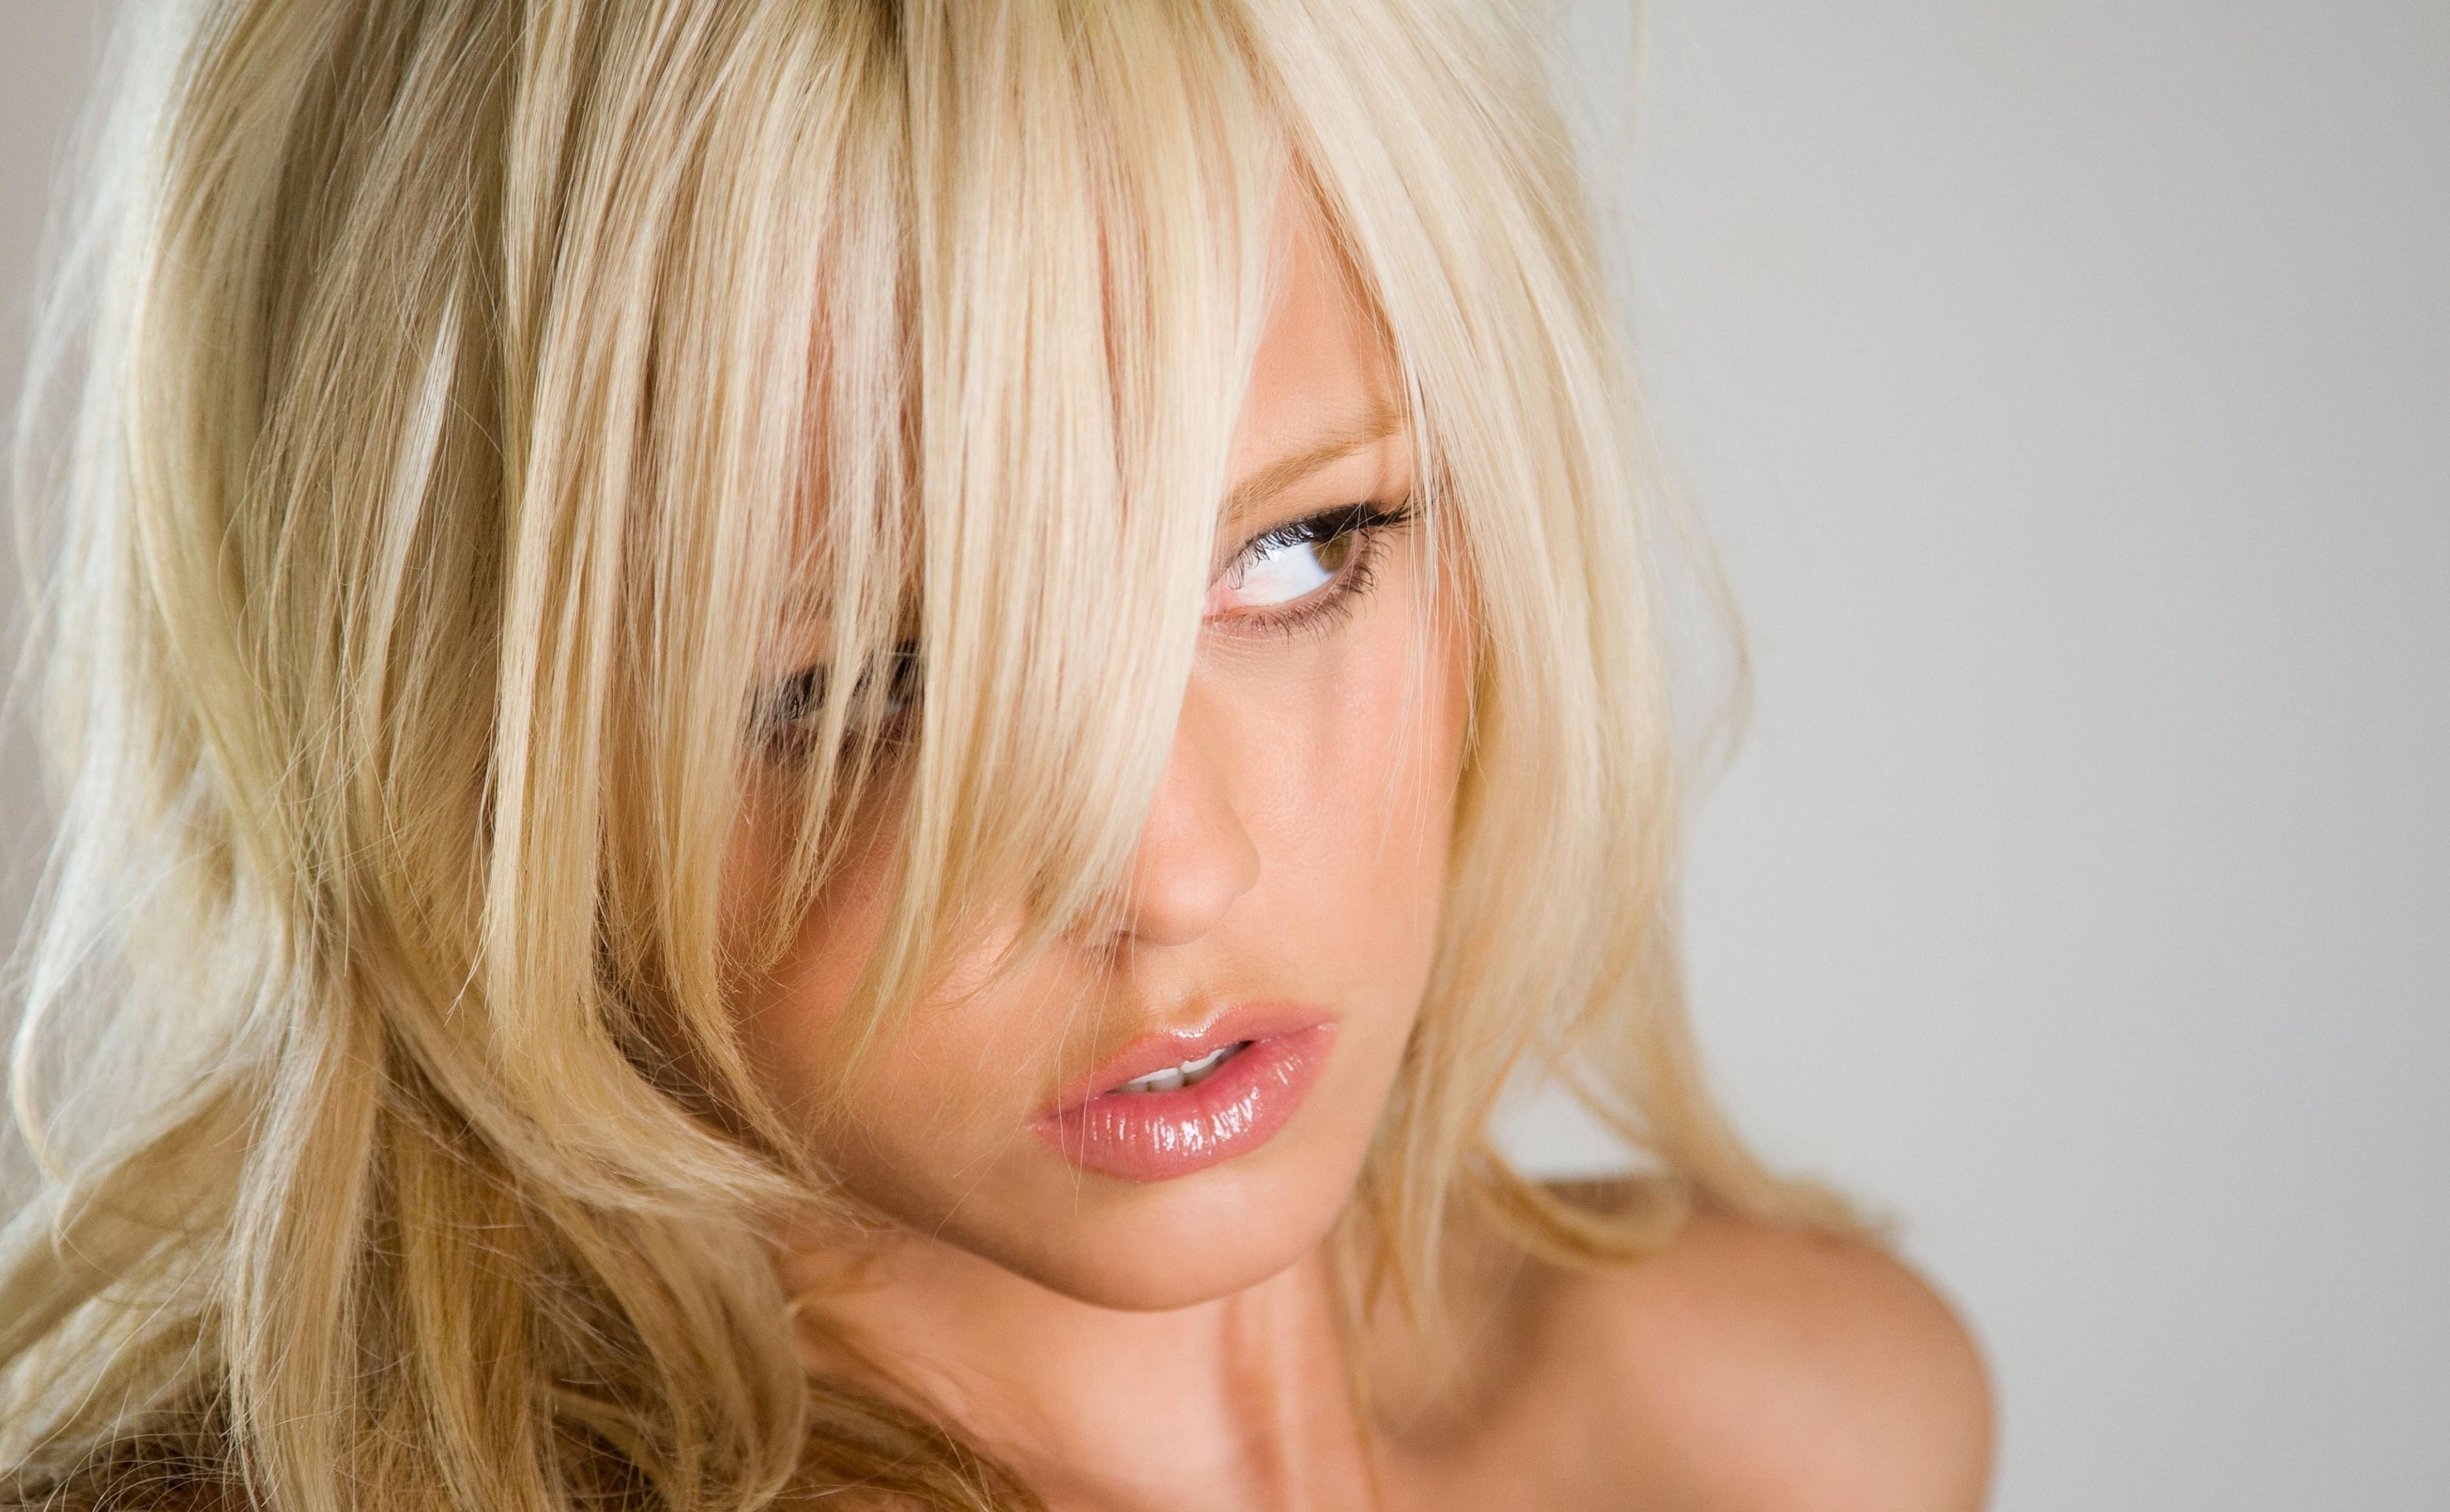 blondes women lindsay marie 1920x1080 wallpaper - People